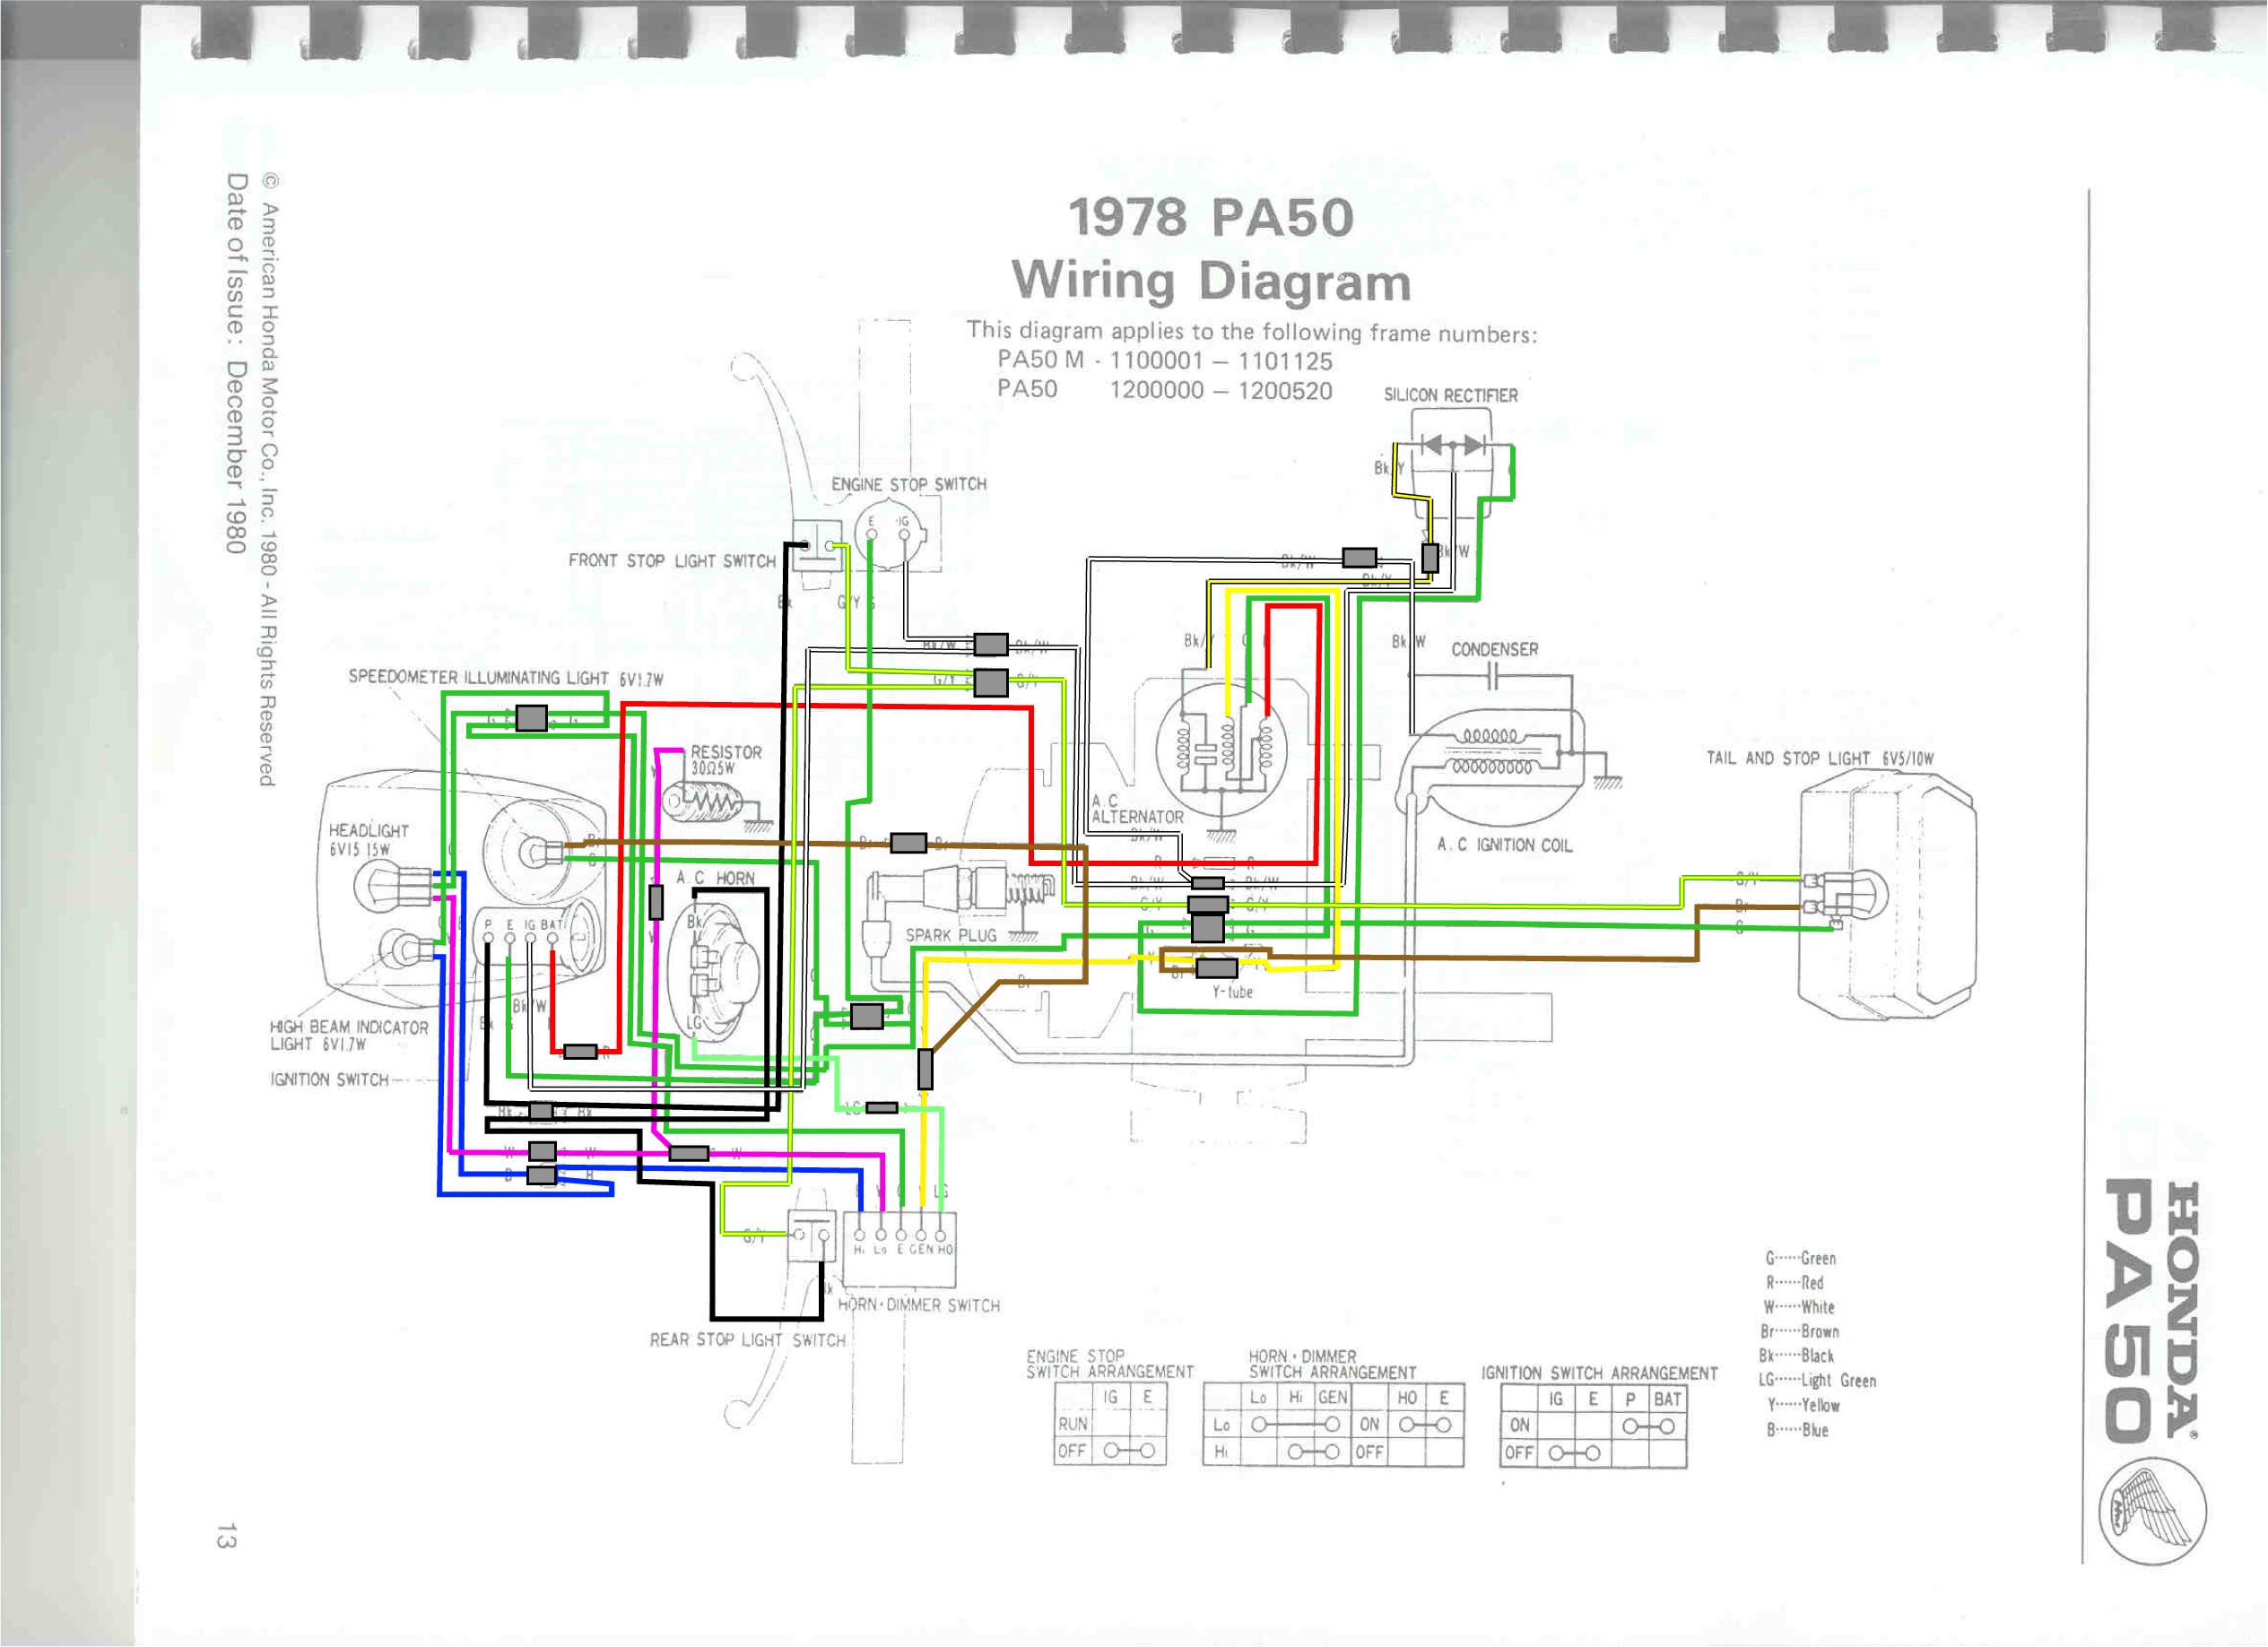 honda today 50 wiring diagram american standard furnace hobbit moped cdi get free